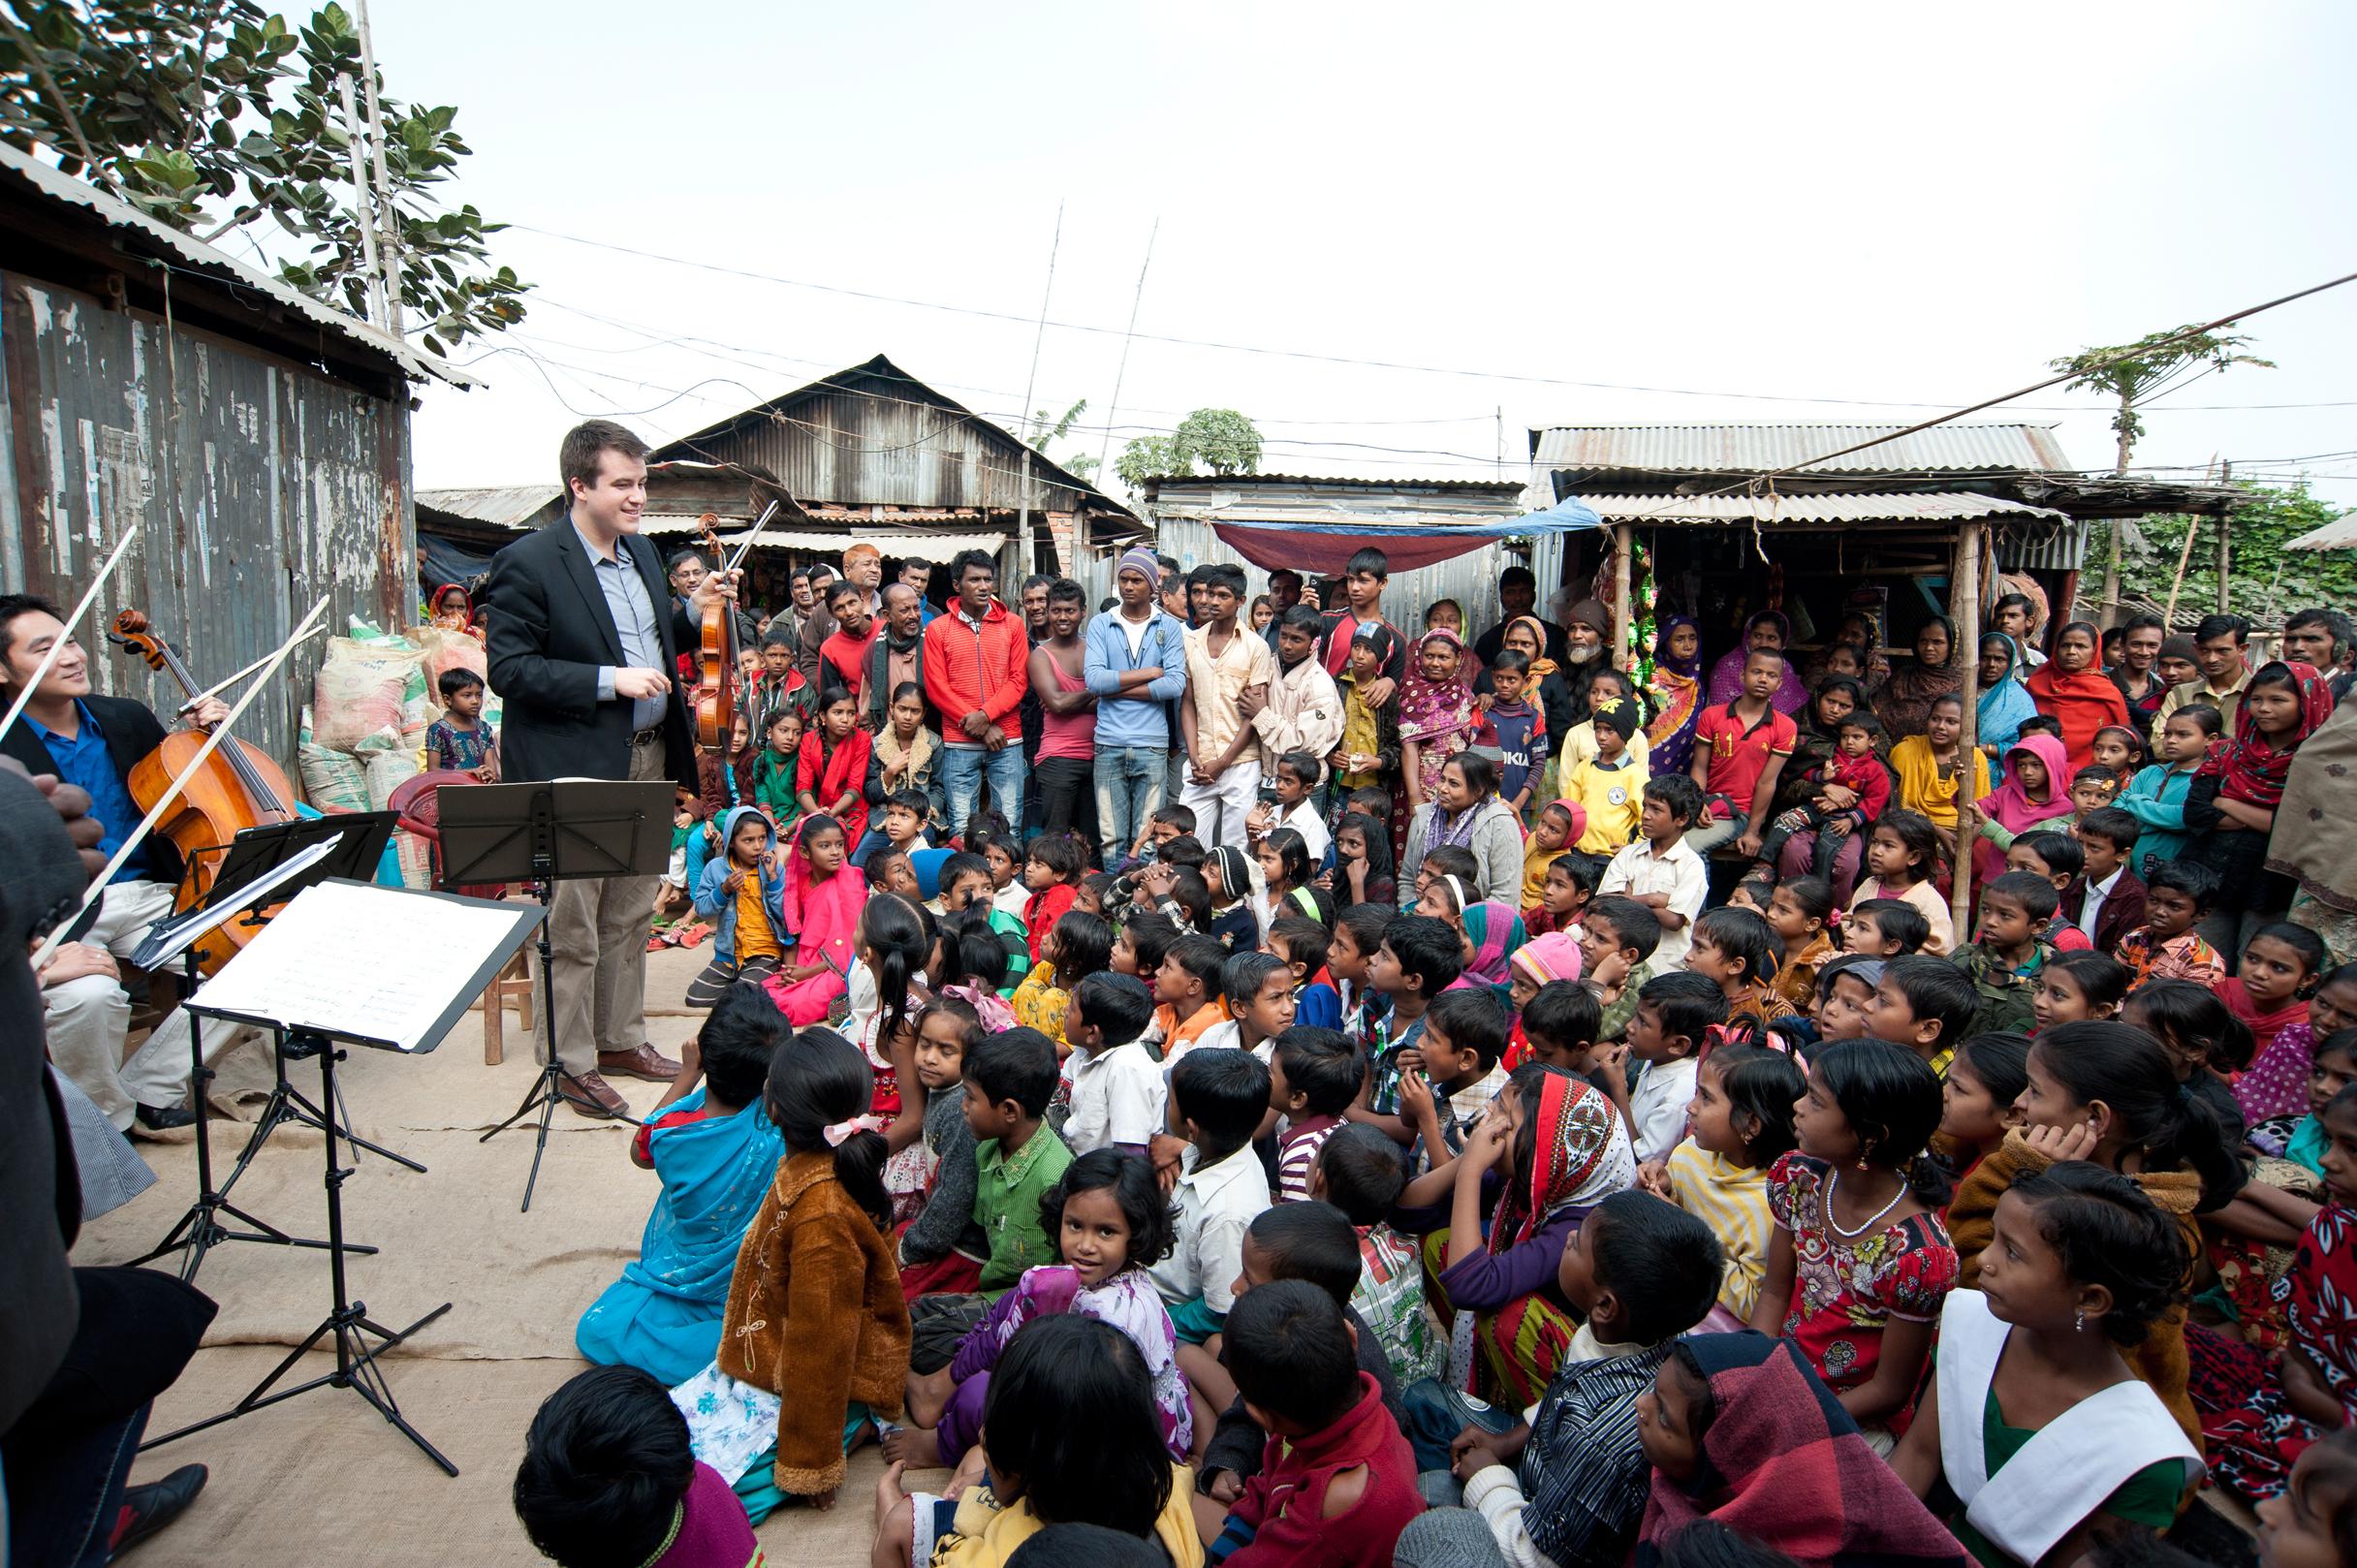 Will Frampton explains about his instrument, the viola, to BDP students in Dhaka. Photo by Shinobu Suzuki.